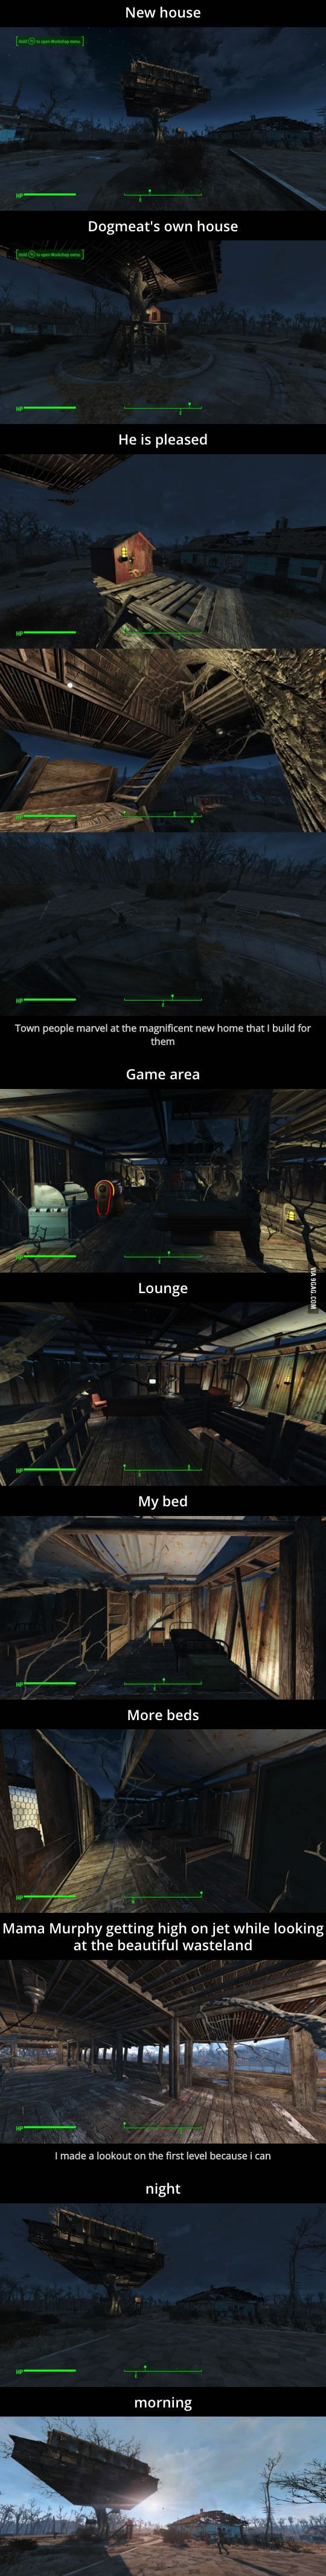 Fallout 4 Base building is fun